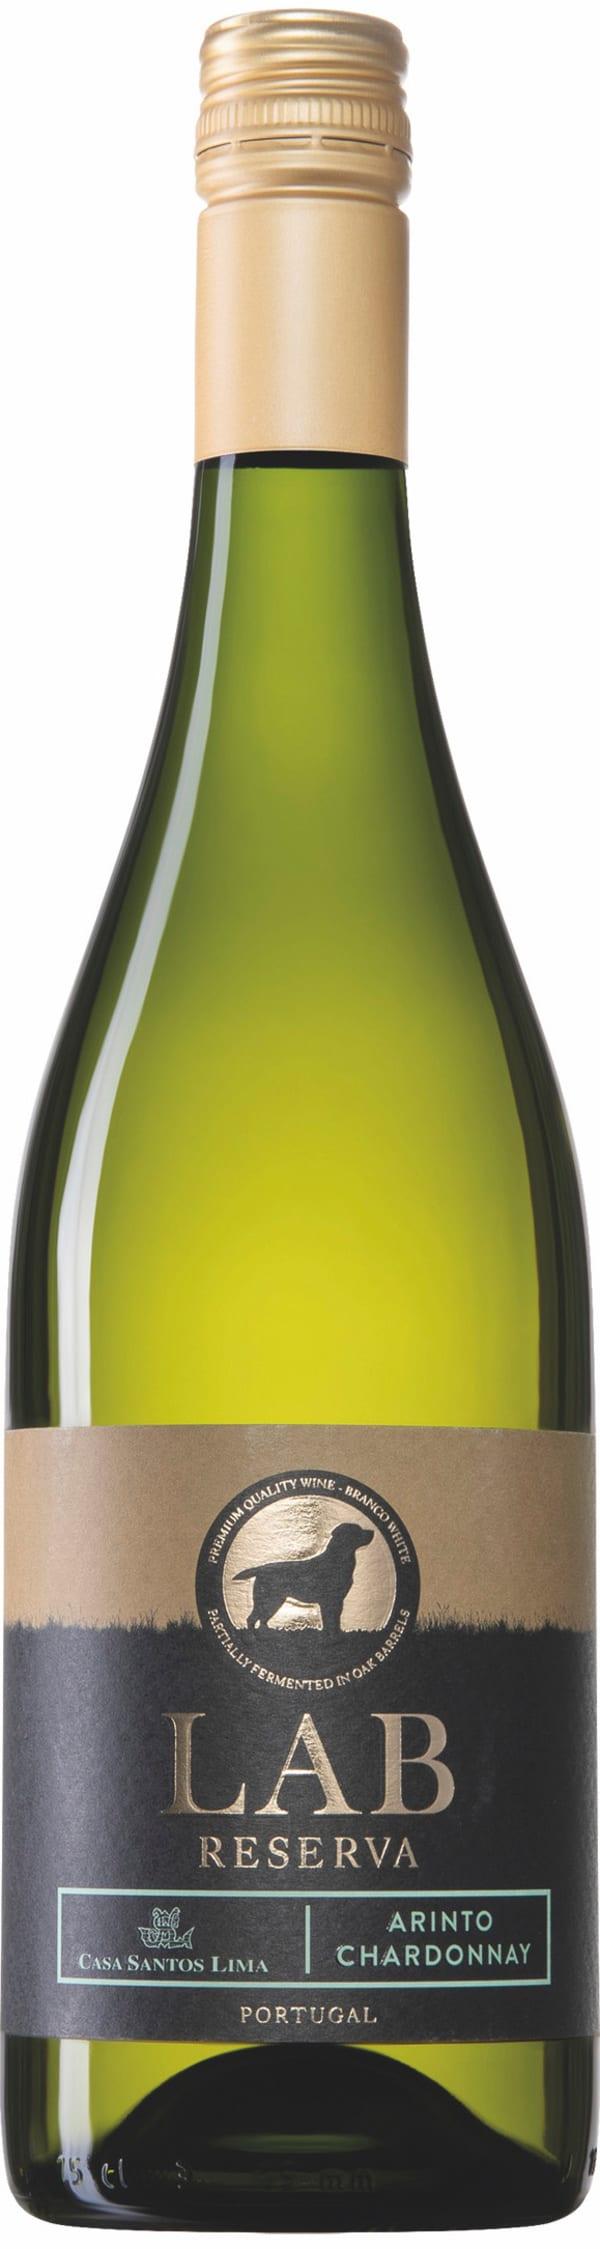 LAB Reserva Arinto Chardonnay 2019